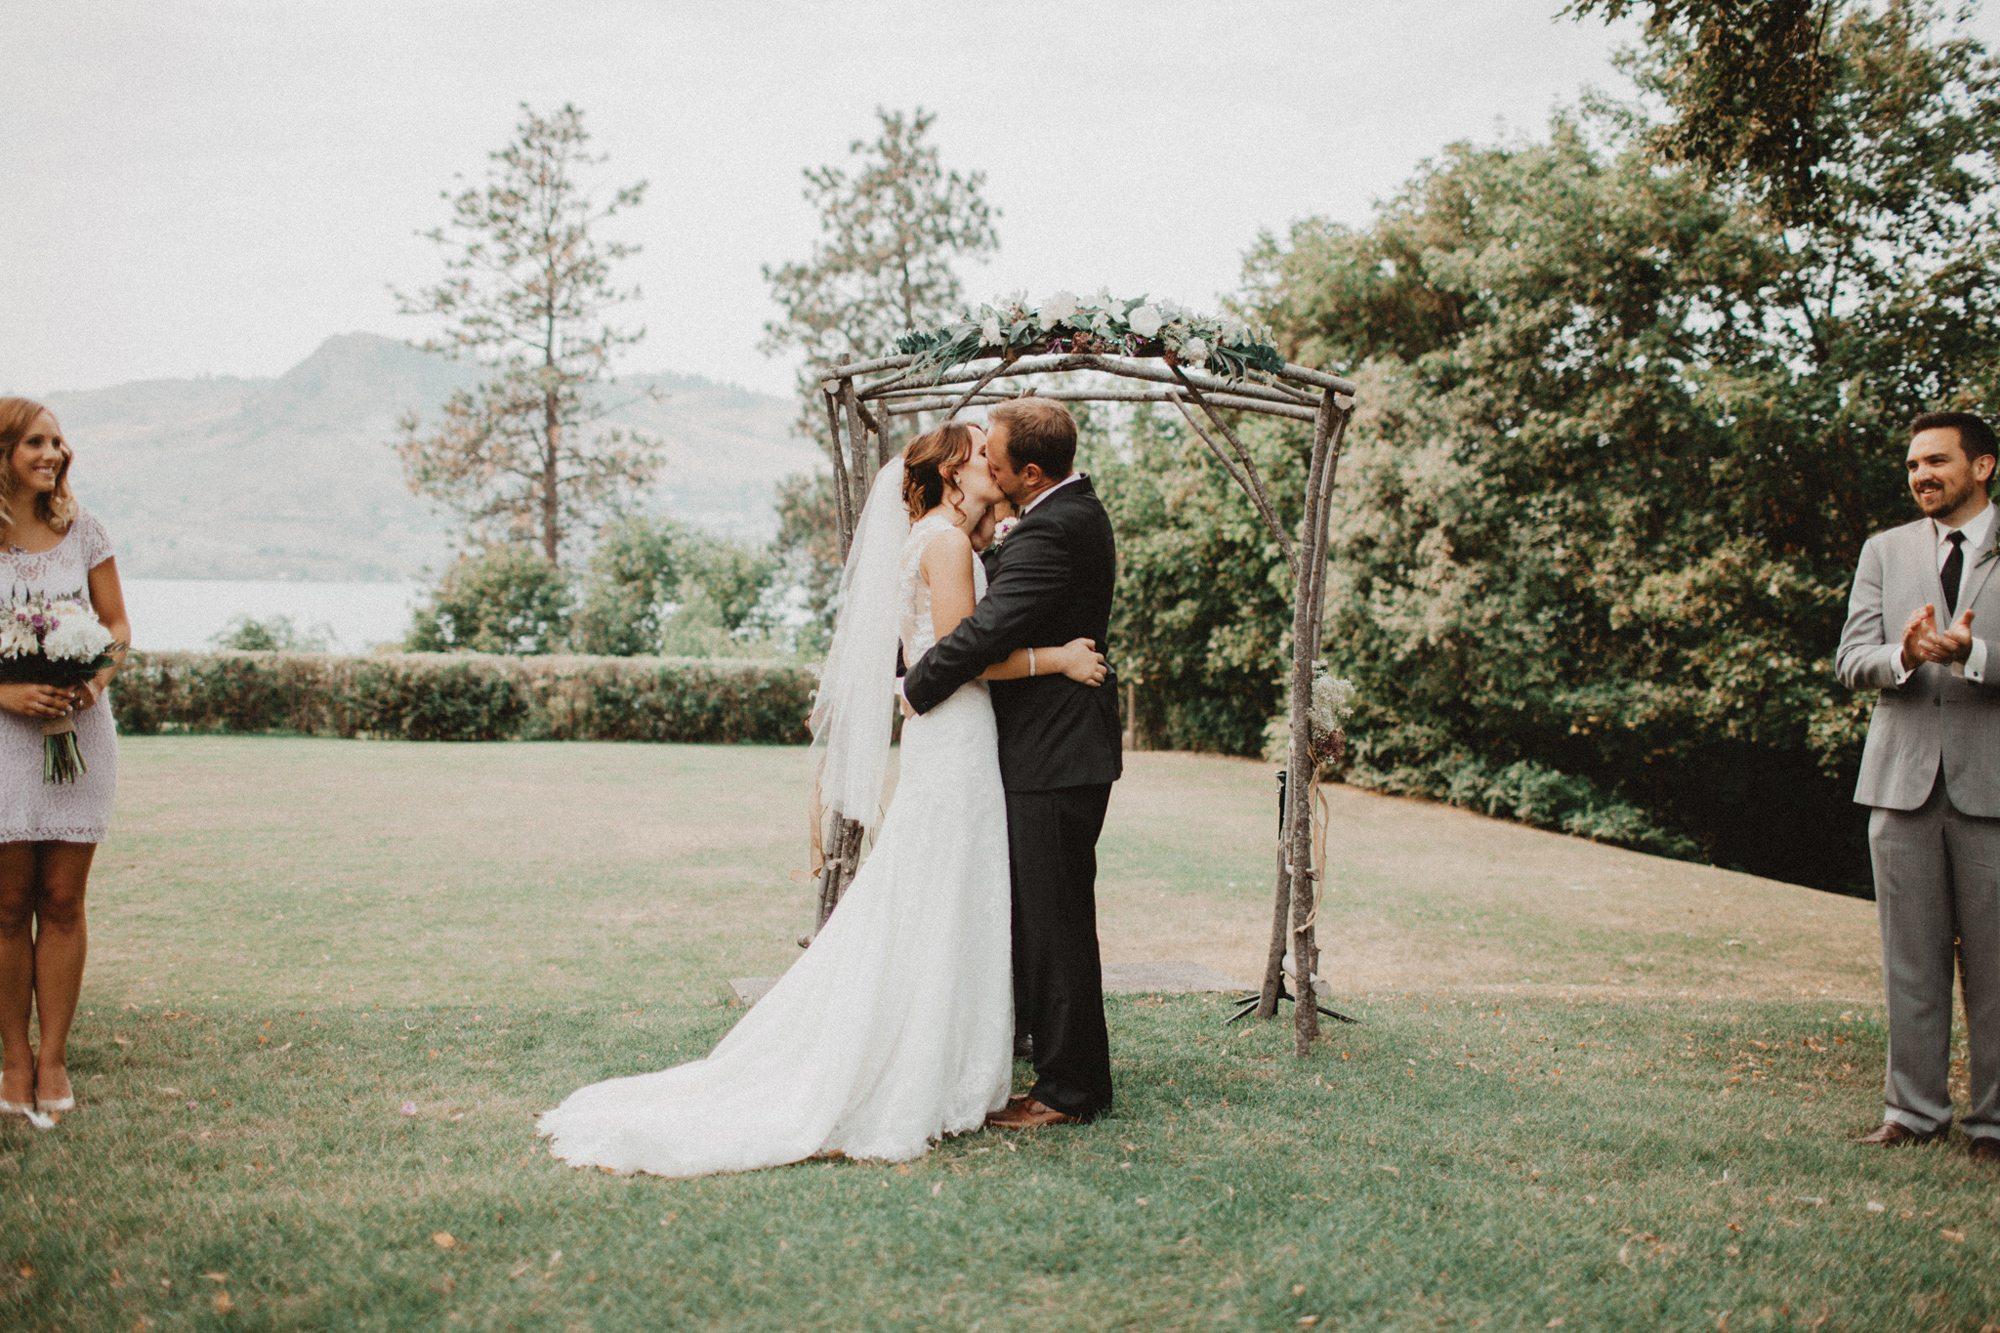 459-vernon-wedding-photographer